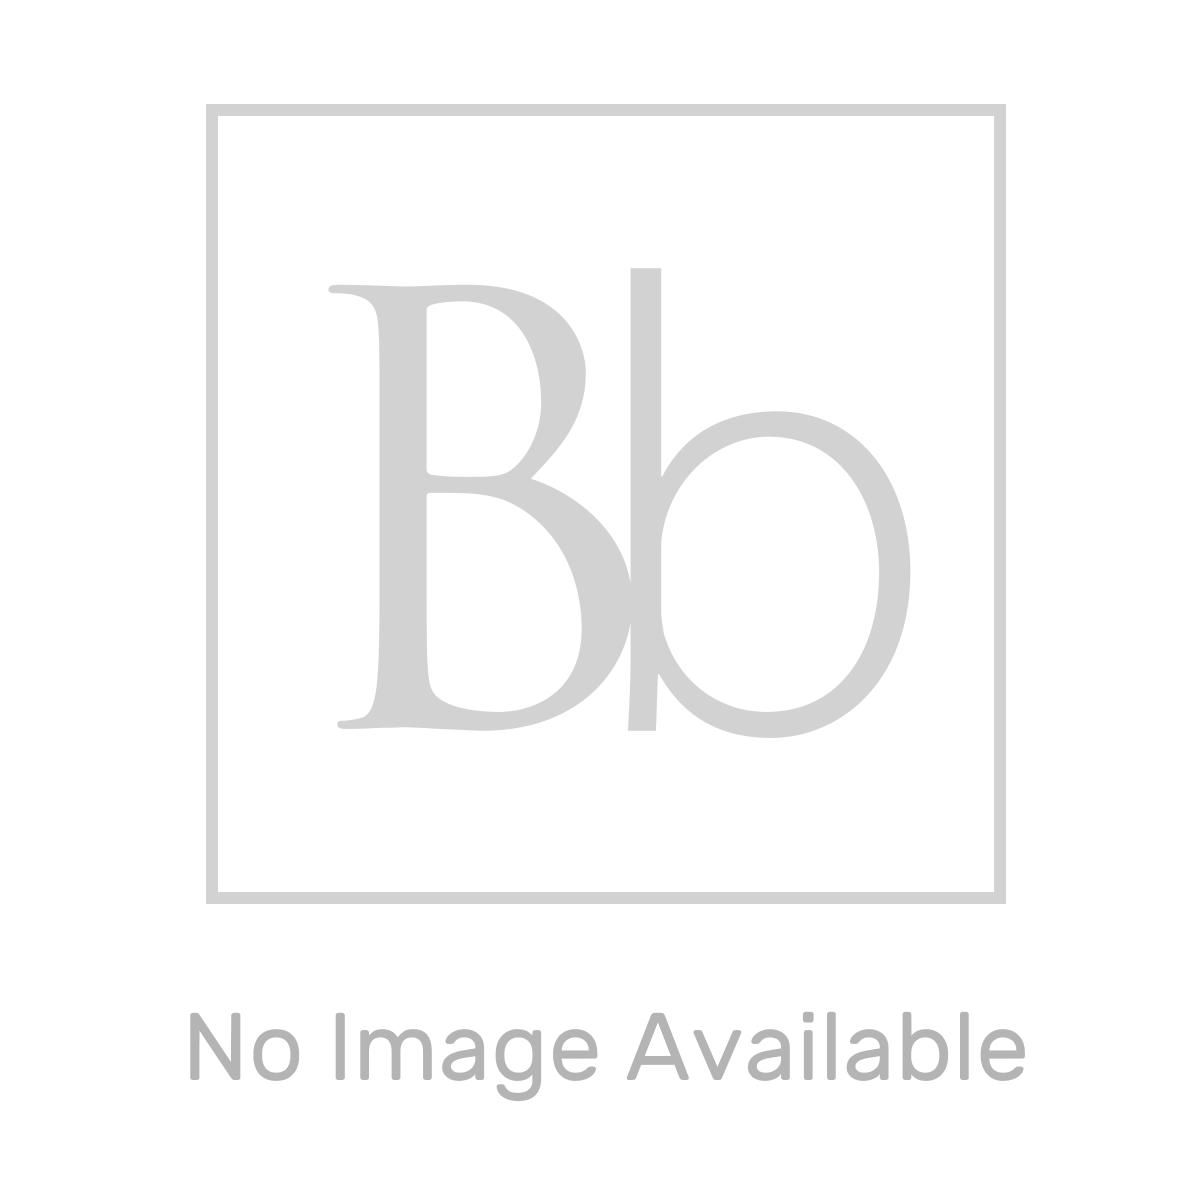 Elation Sendai Dijon Walnut Framed Mirror 450mm Measurements